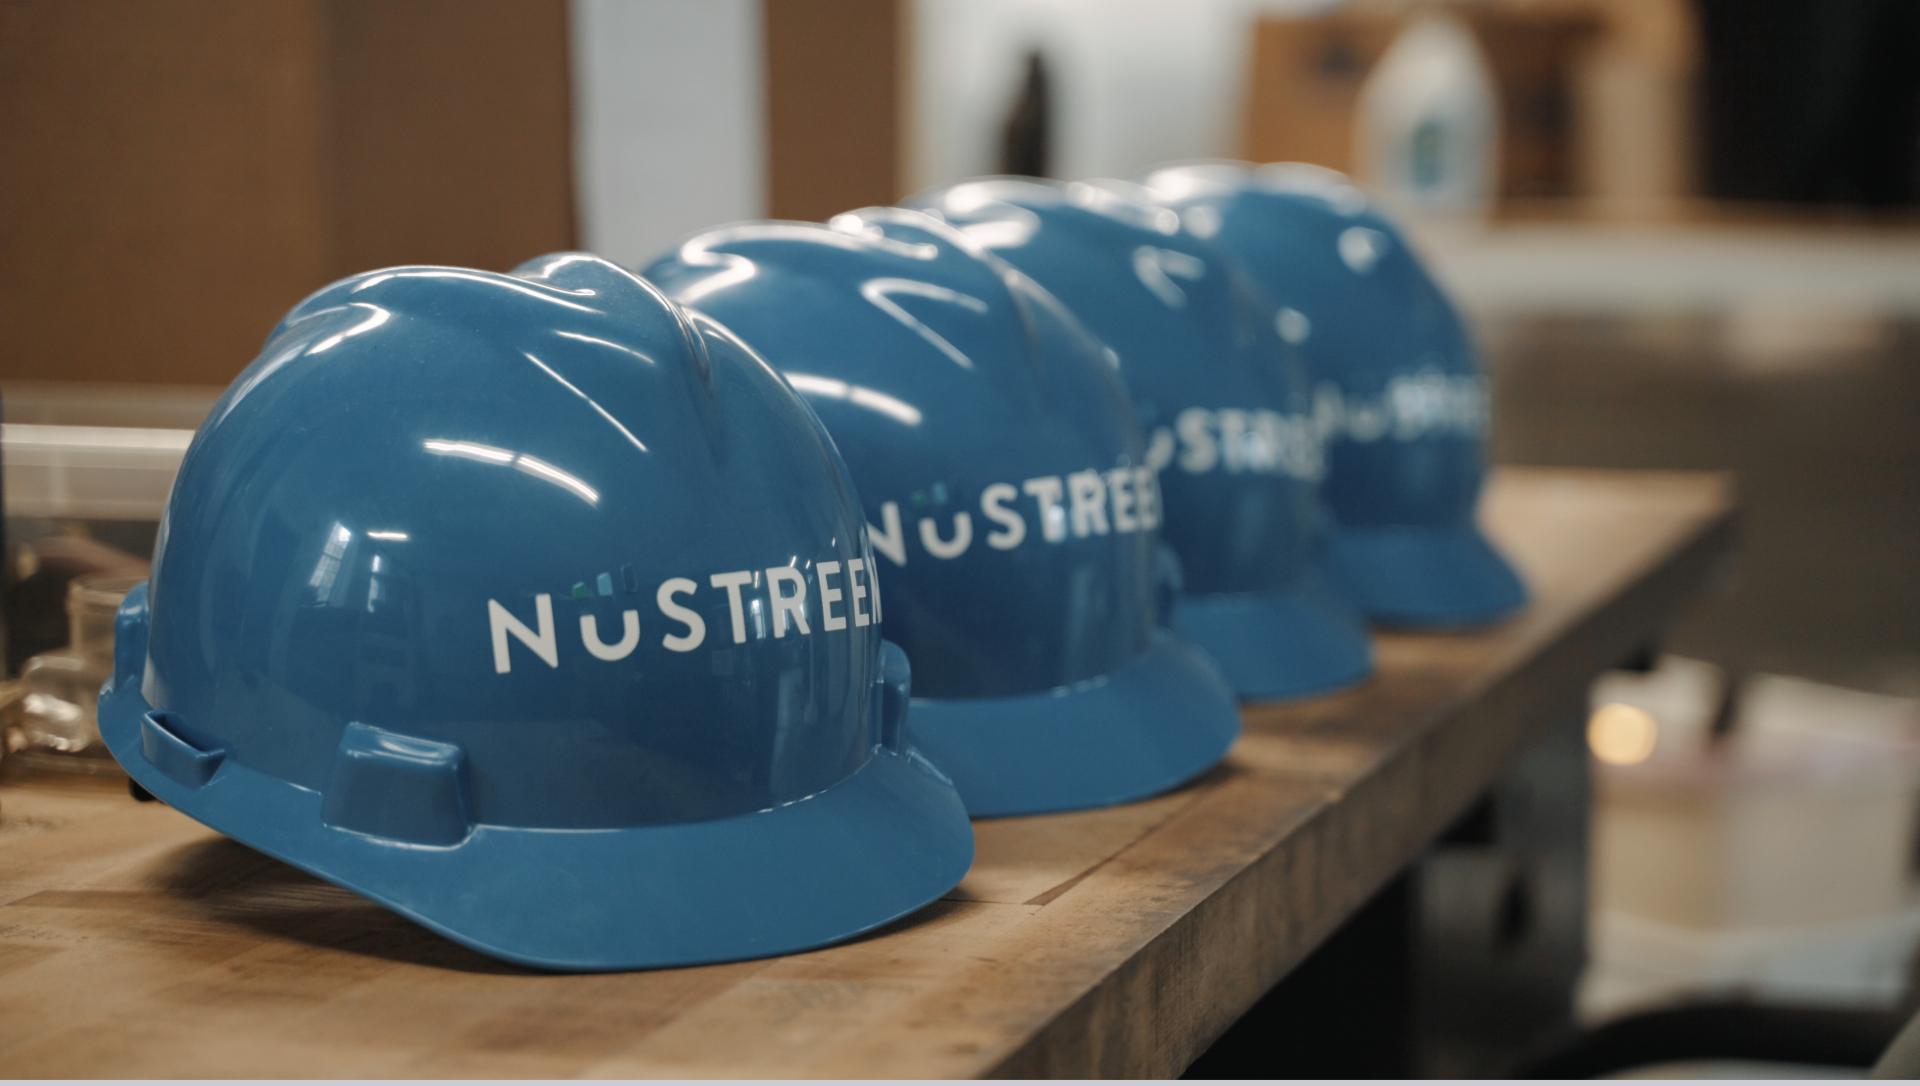 NuSTREEM Hard Hats